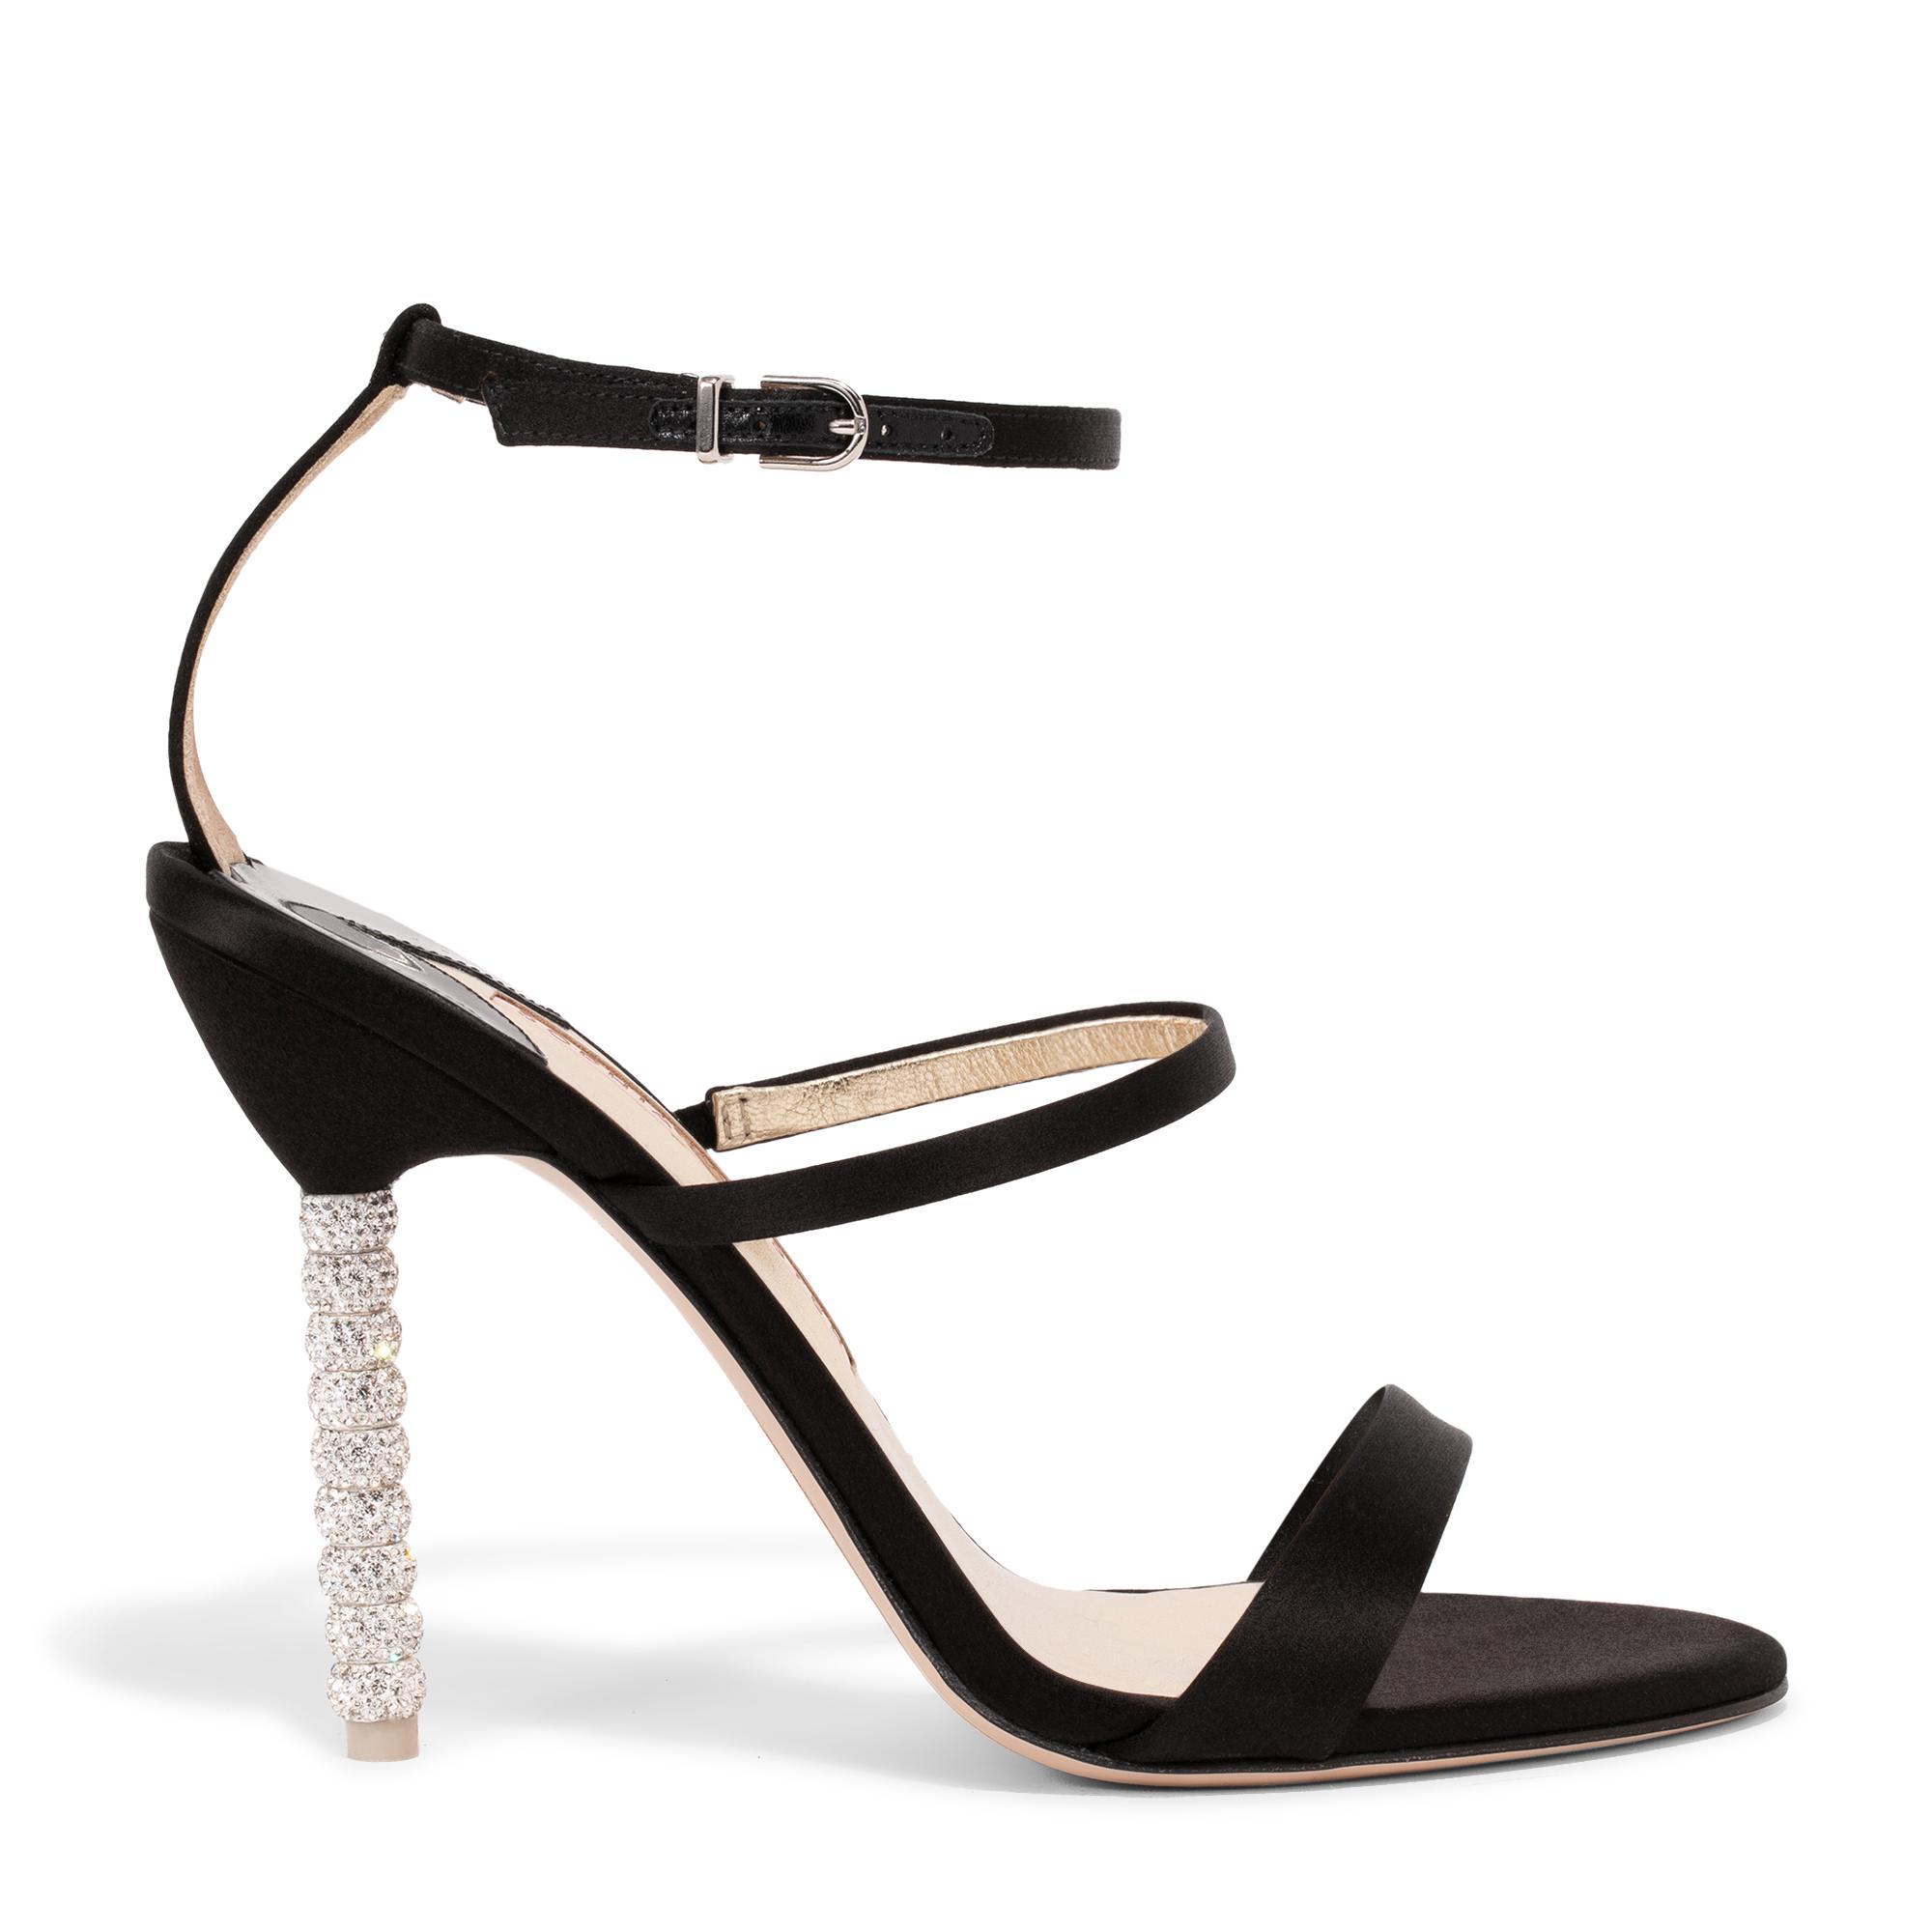 Rosalind sandals